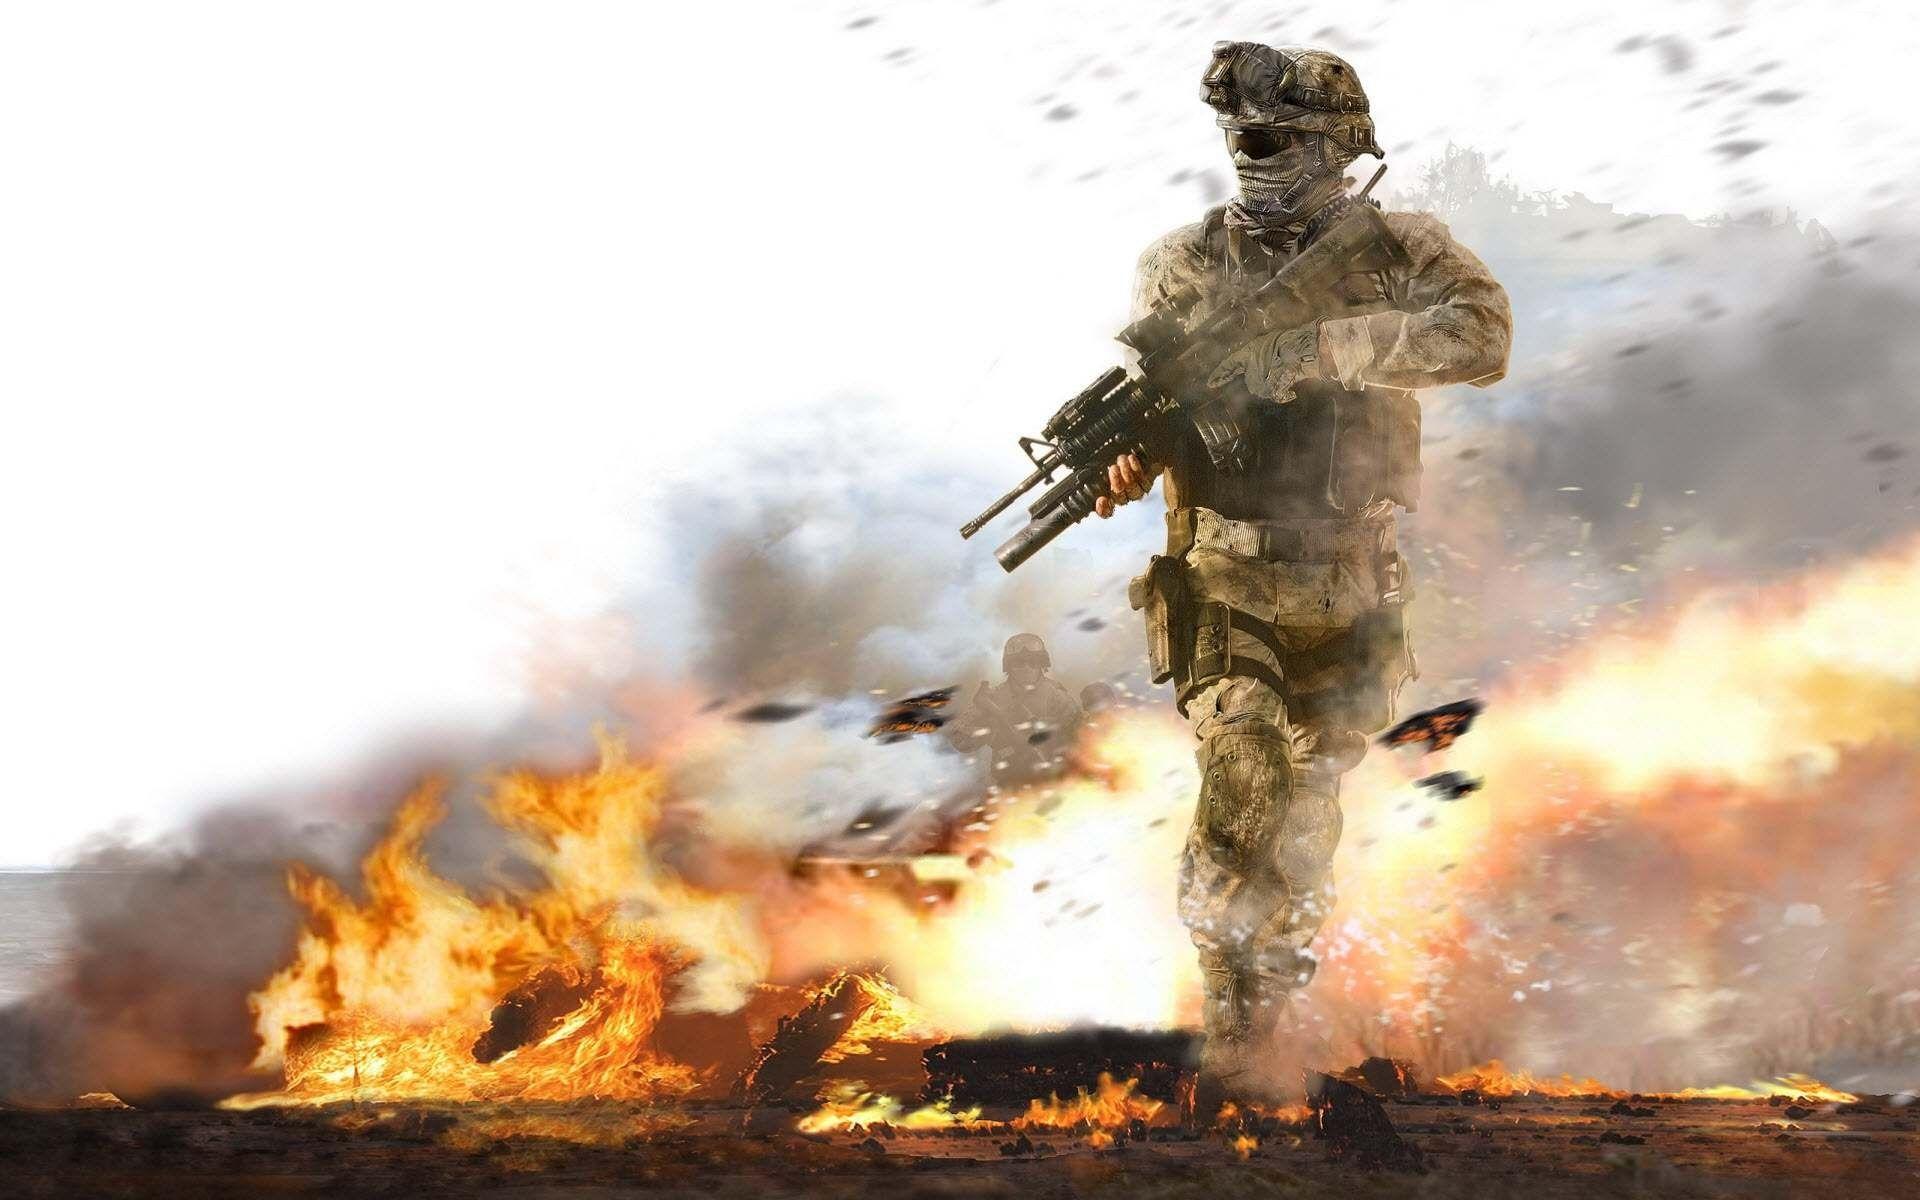 Soldier Call Of Duty Modern Warfare 2 War Video Games Army